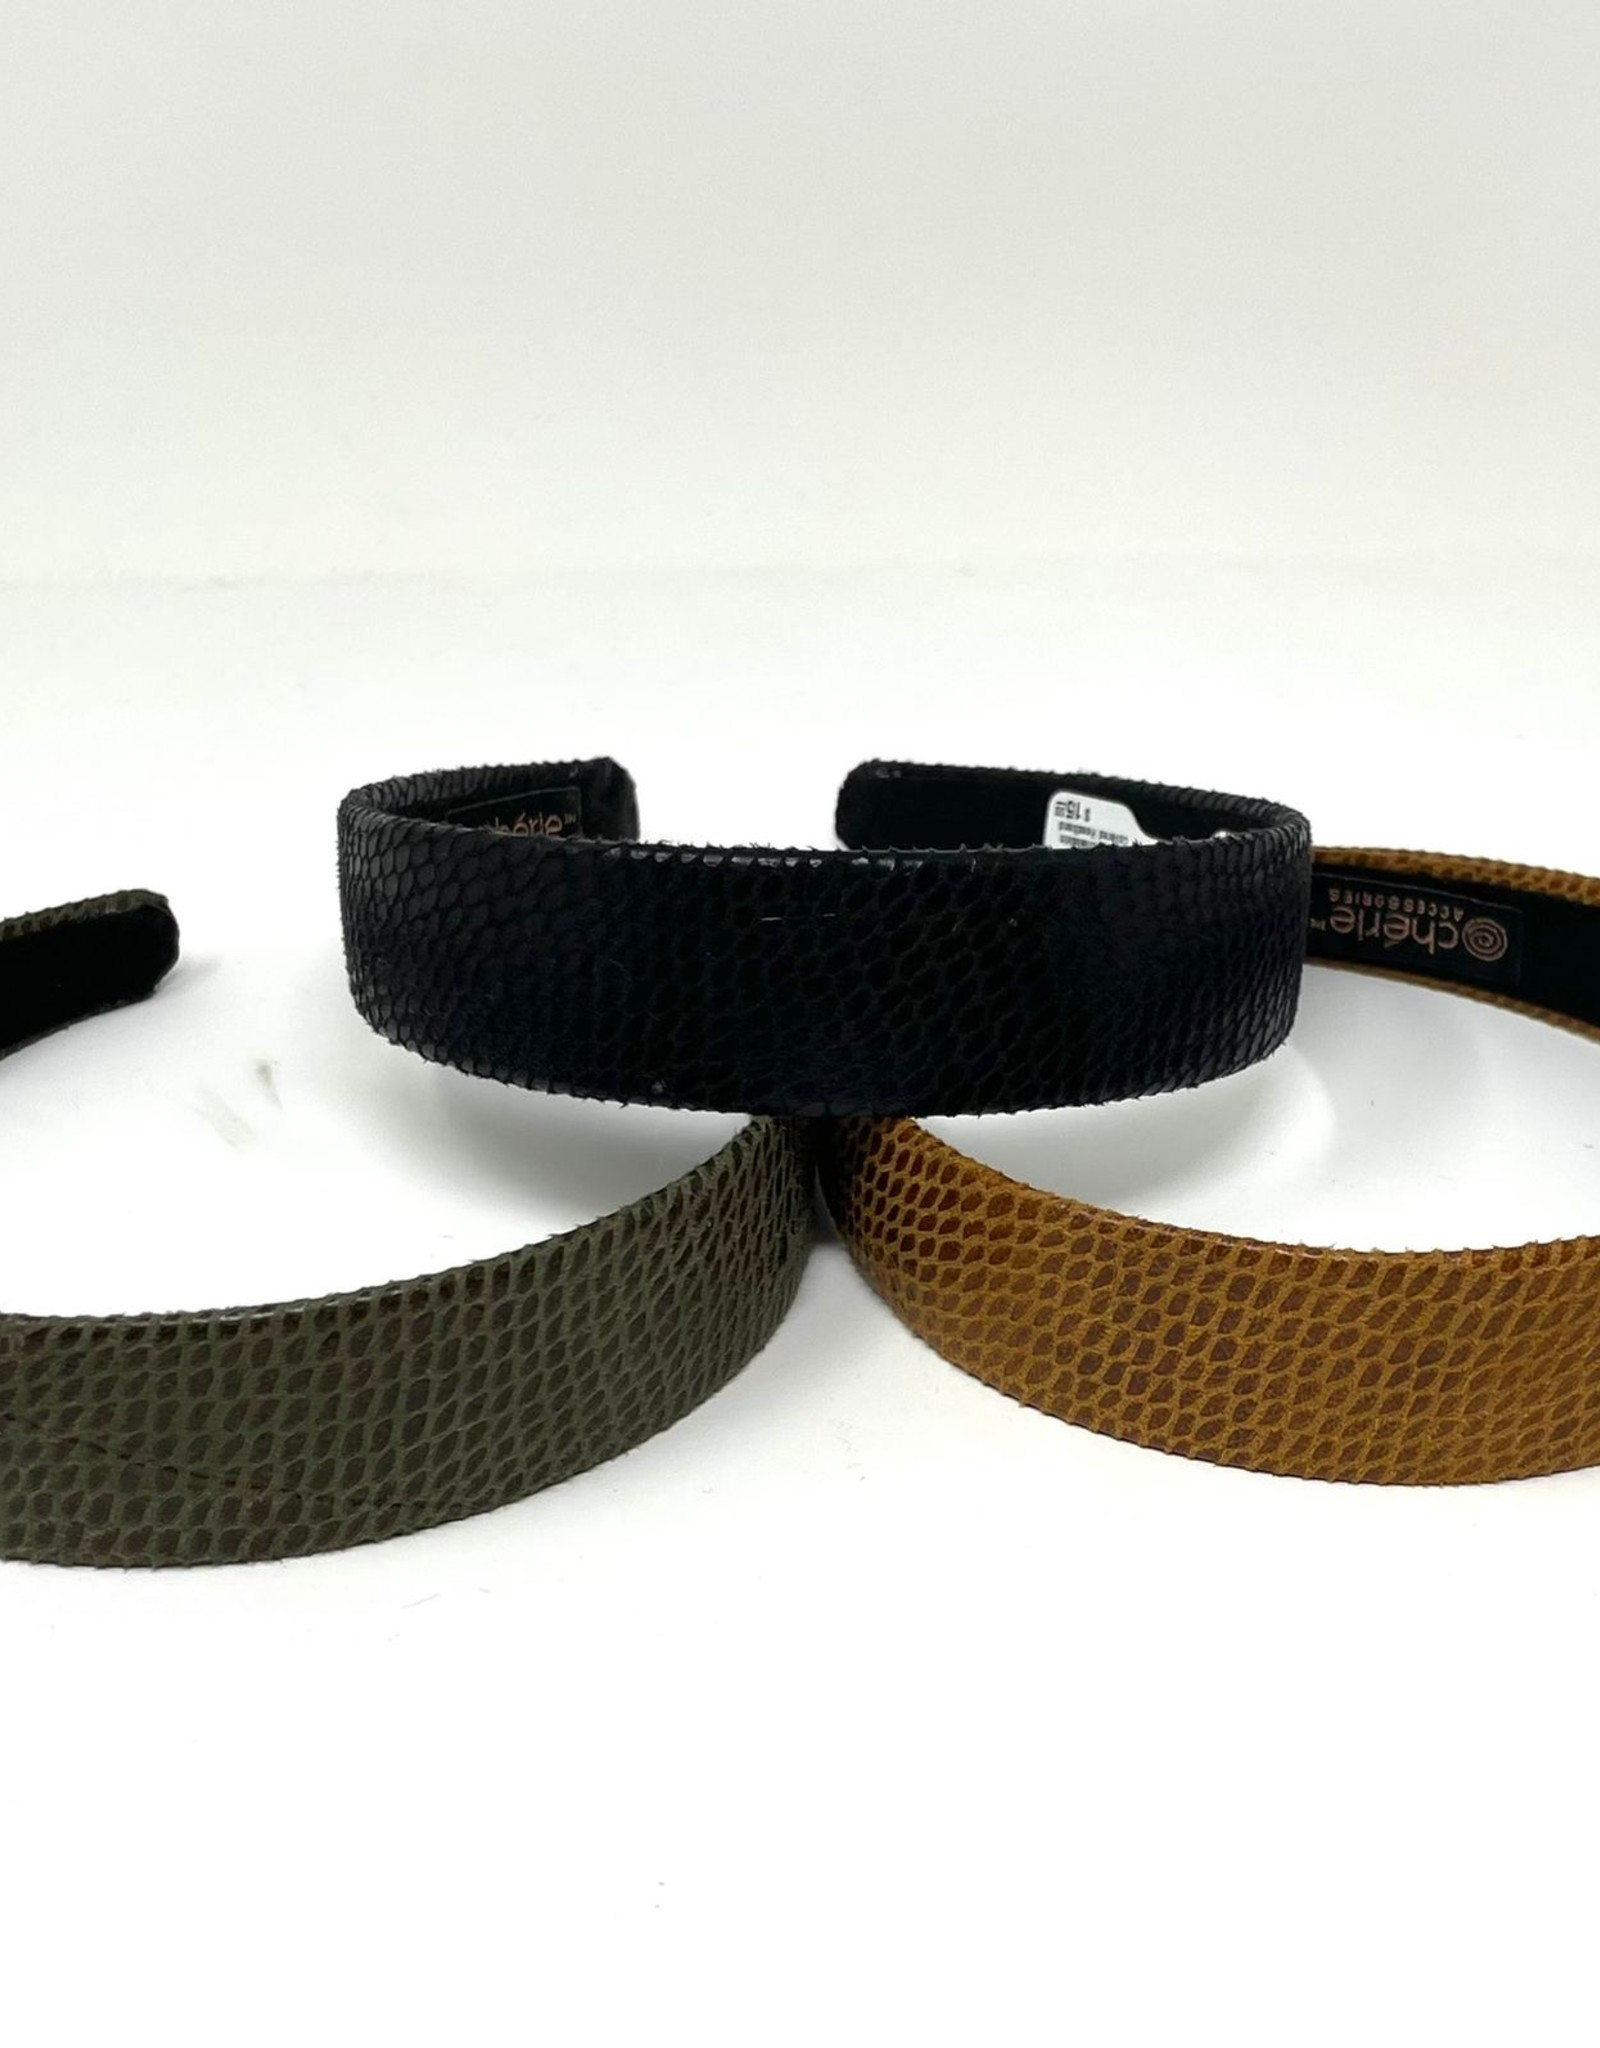 Cherie Cherie Wide Leather Snakeskin Covered Headband